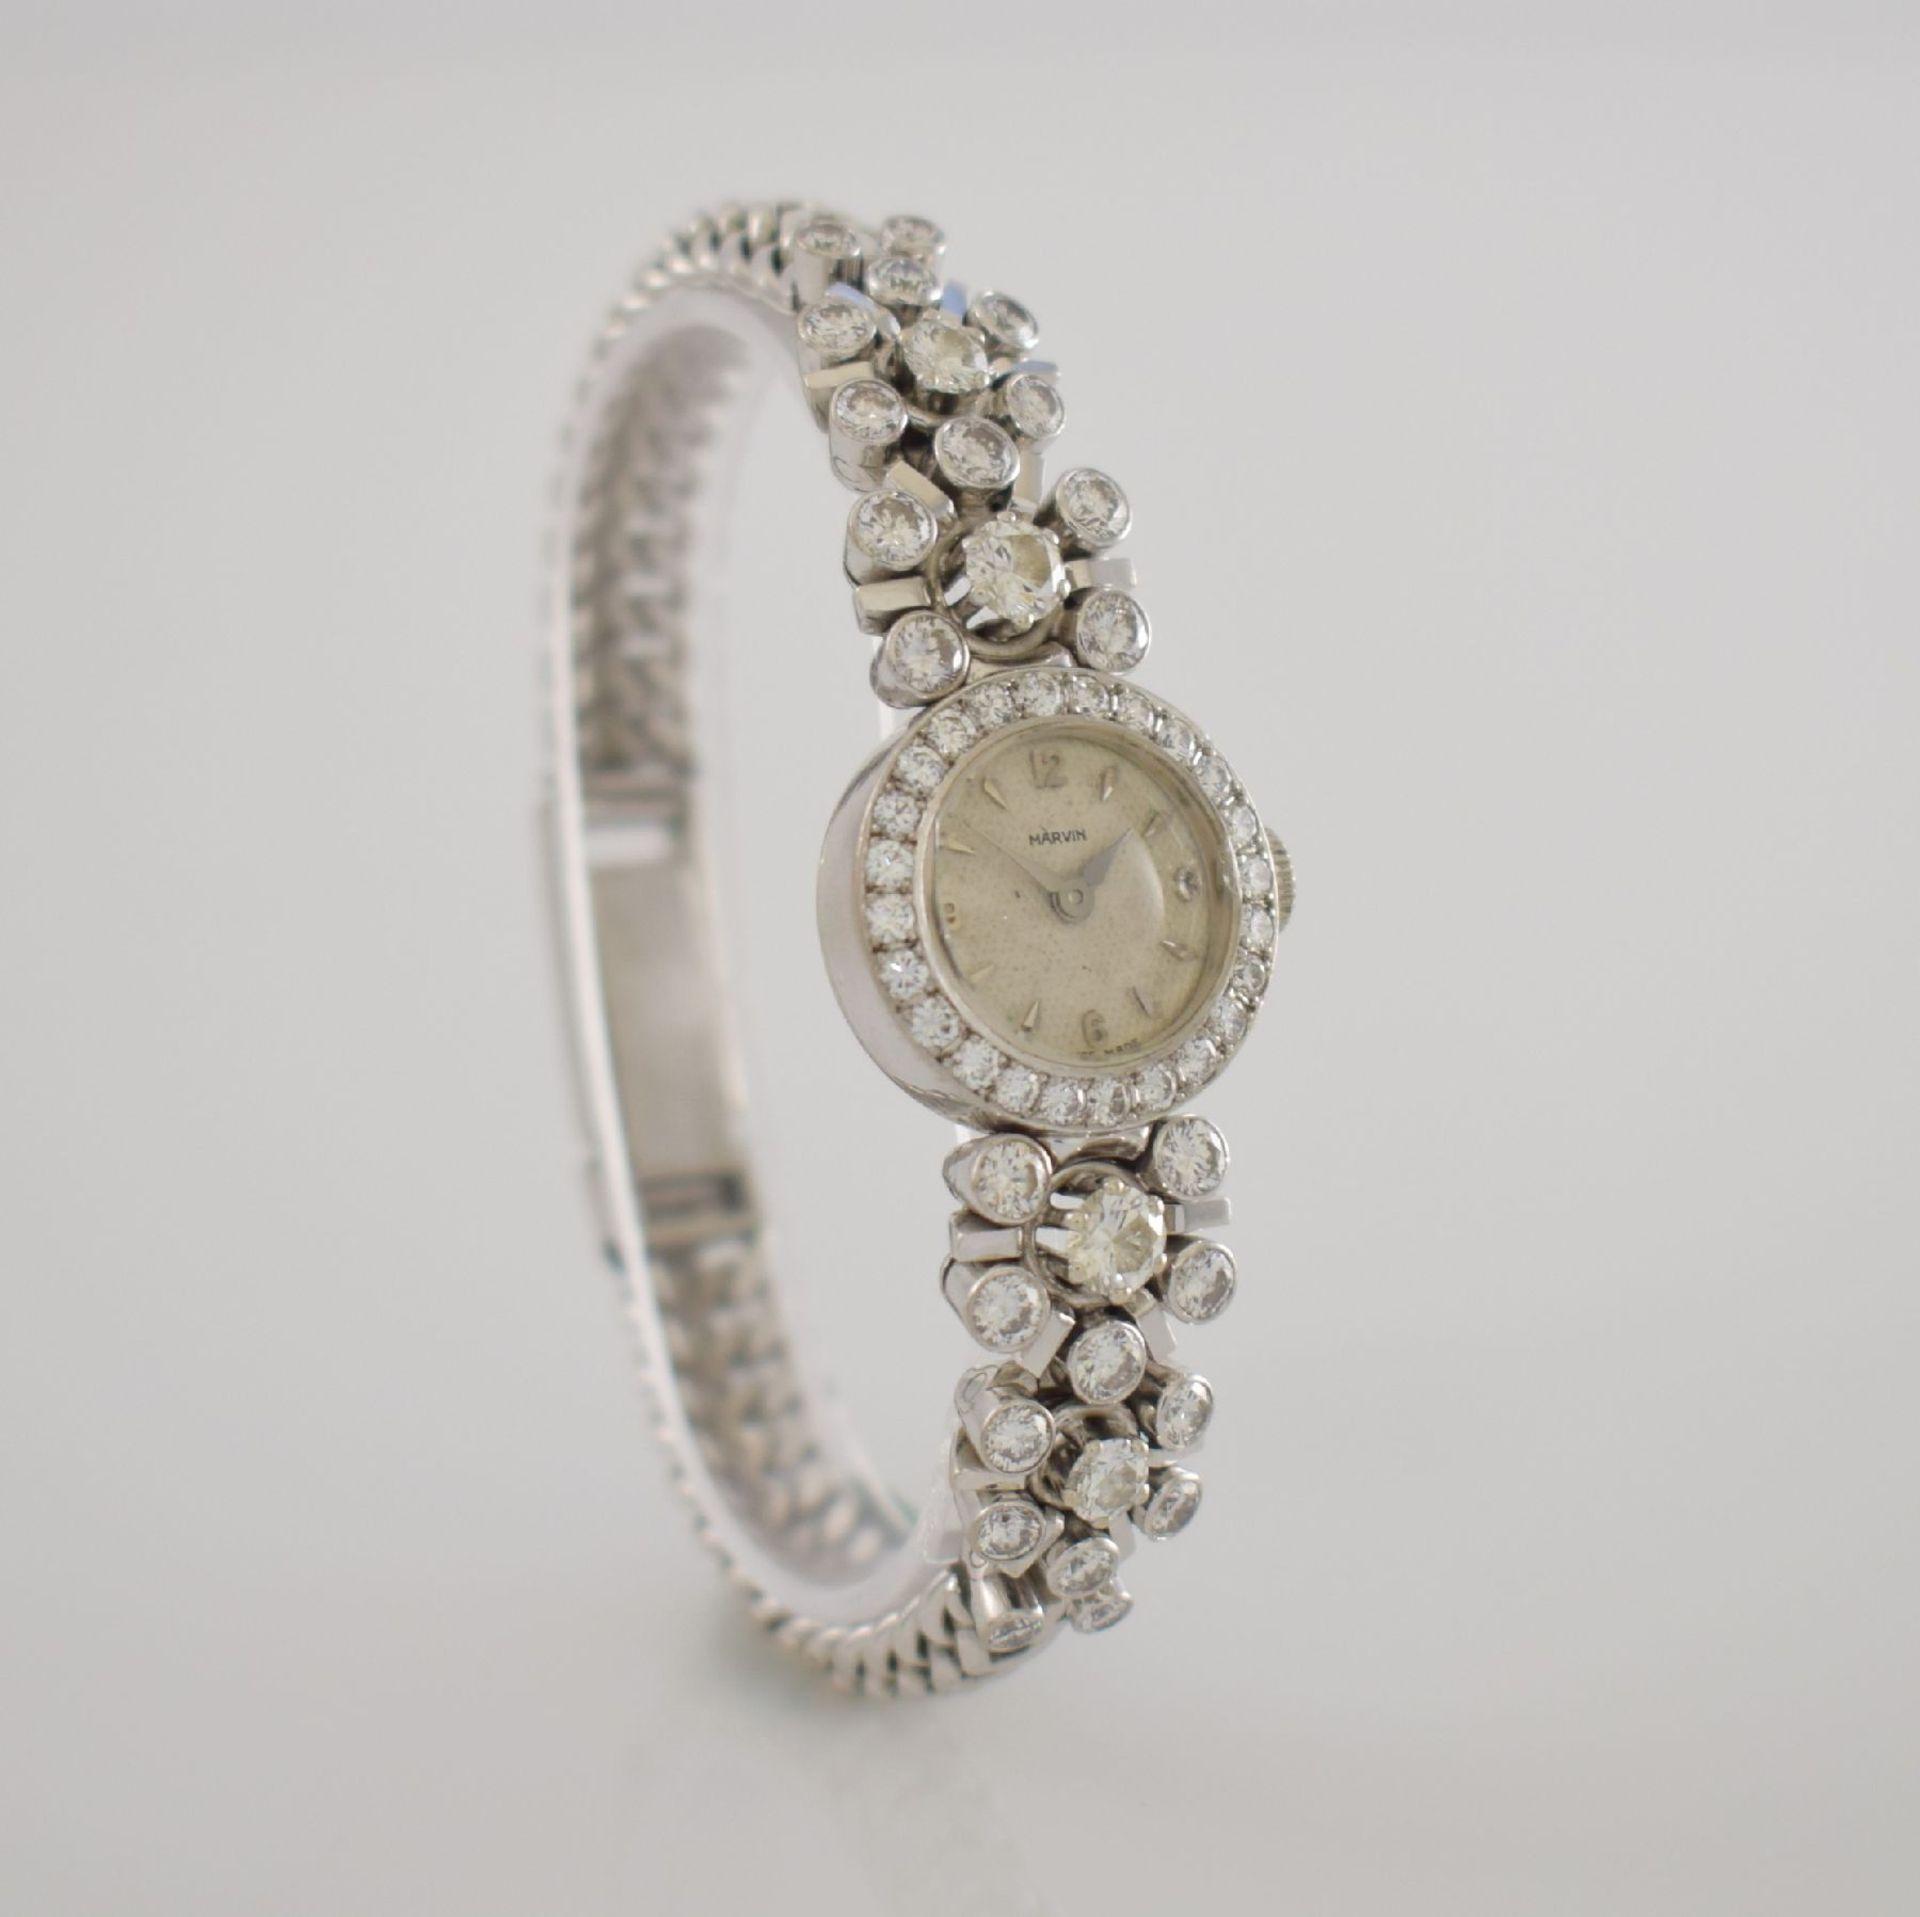 MARVIN Art Deco ausgefallene Damenarmbanduhr in WG 585/000 m. Diamanten zus. ca. 2,50 ct, Schweiz um - Bild 4 aus 5